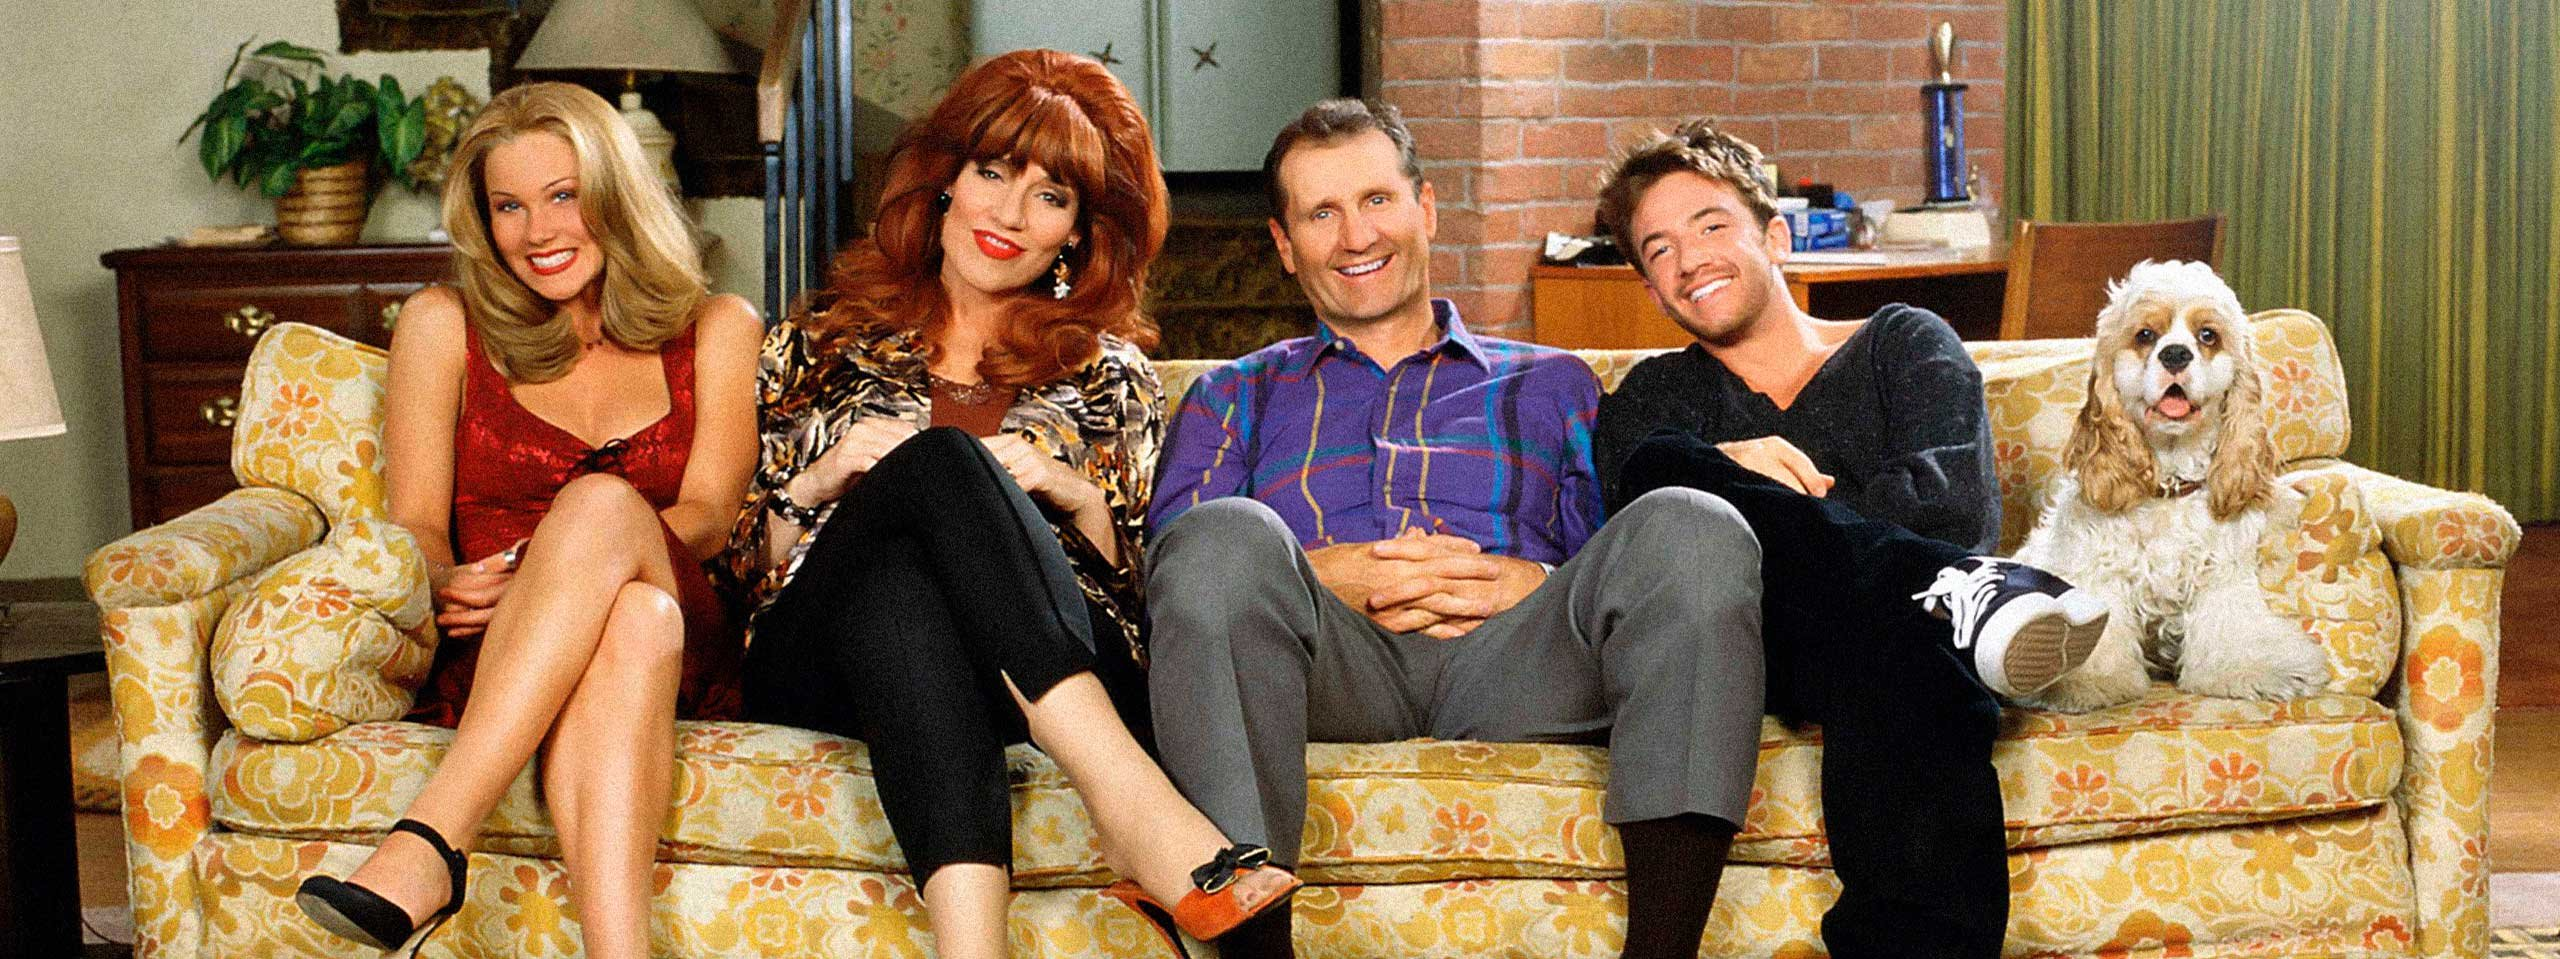 Review: Married With Children - Season 11 - SLUG Magazine